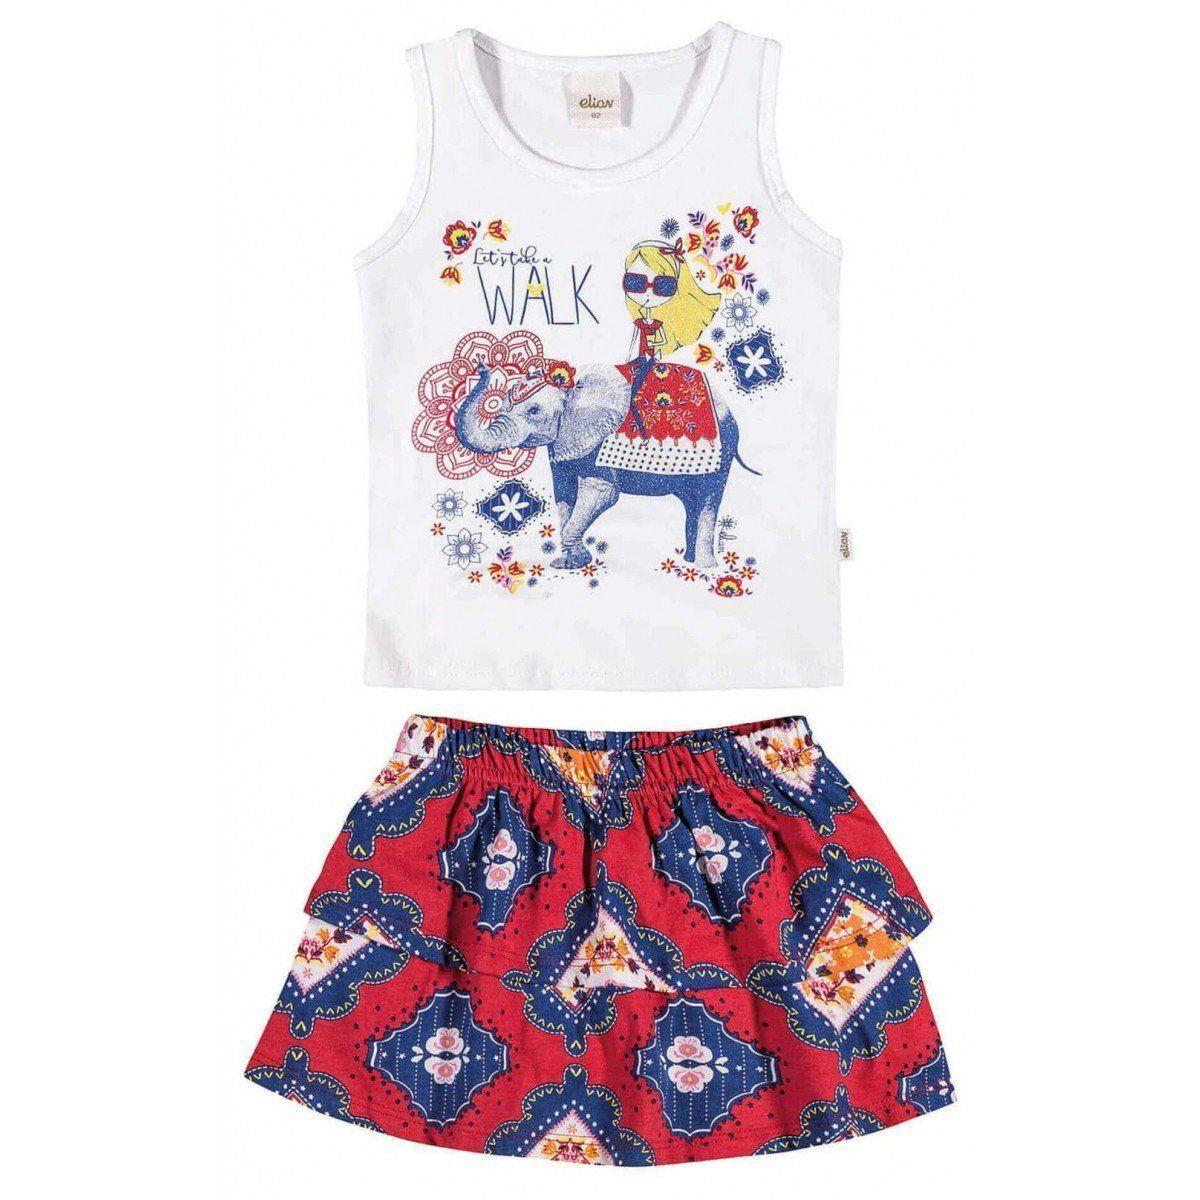 Conjunto Infantil Feminino Vermelho Walk Elian